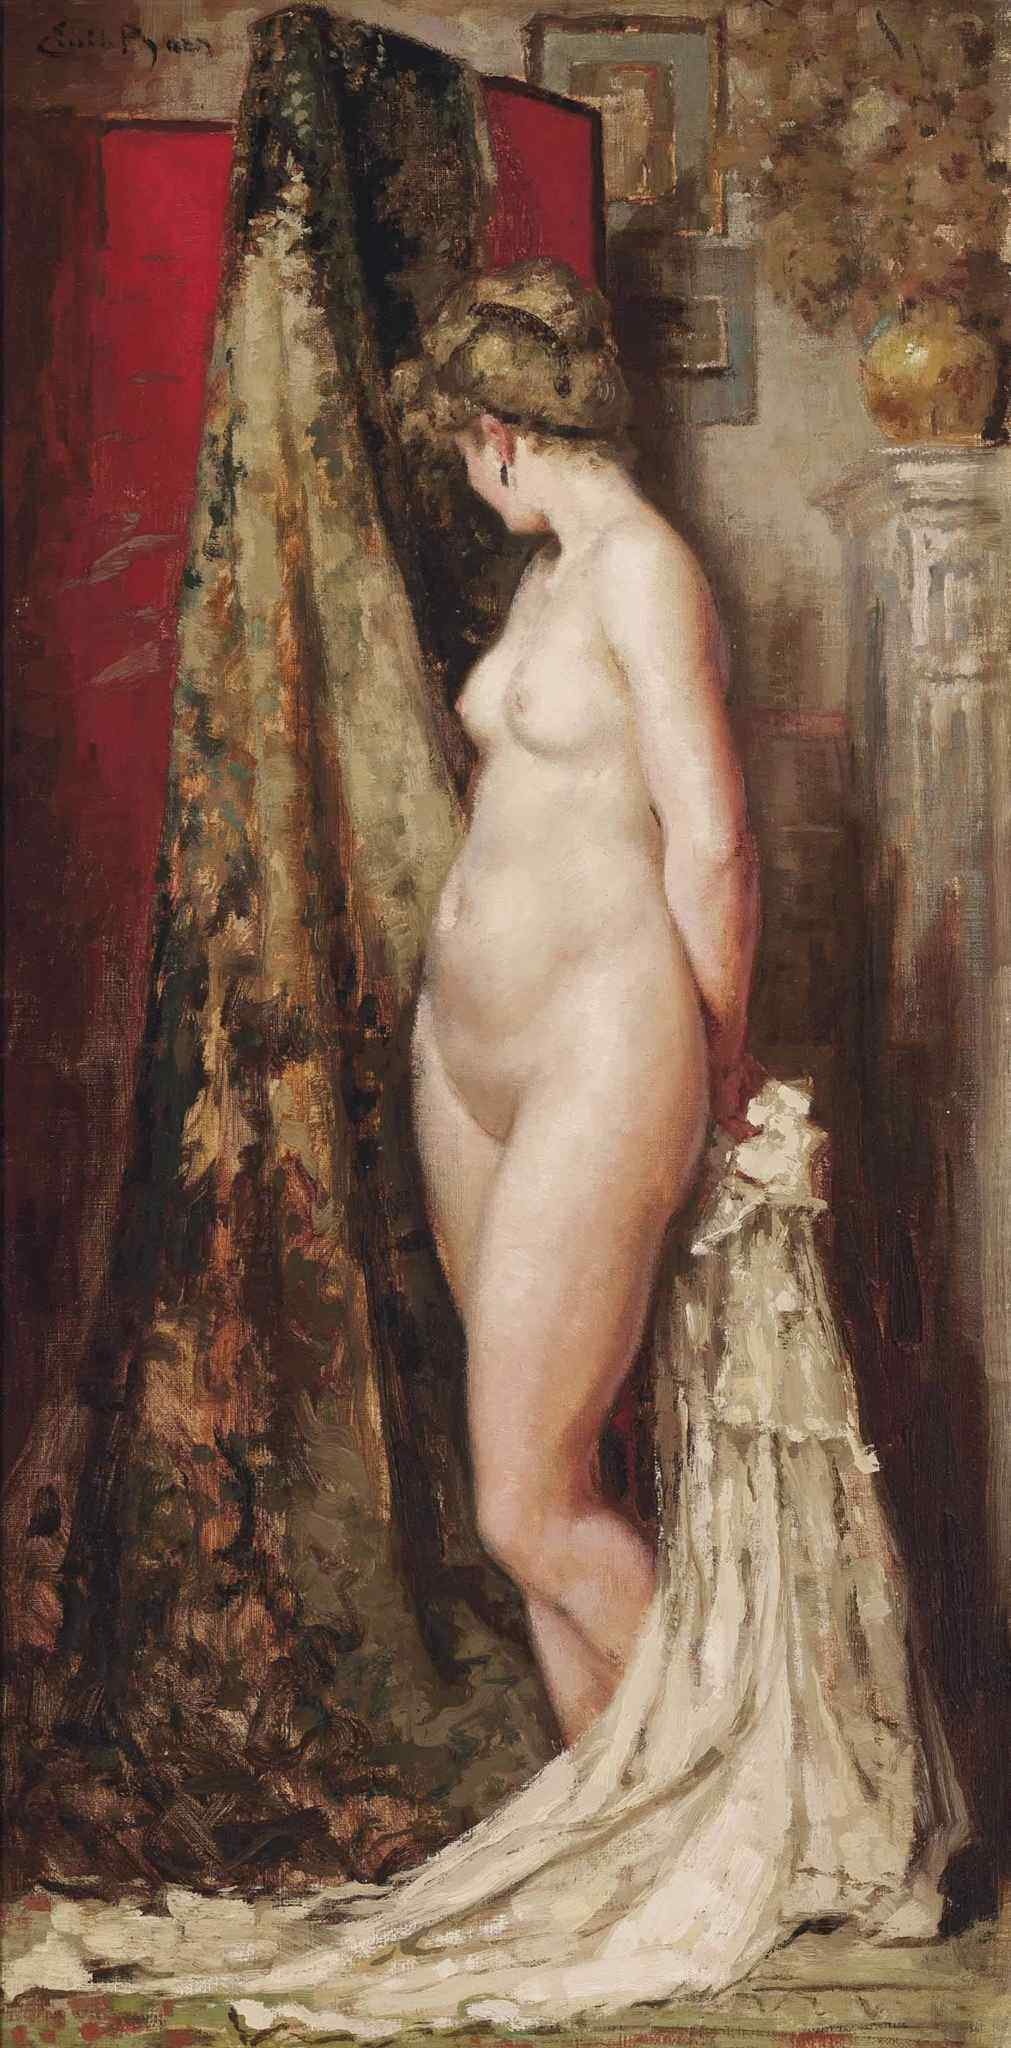 Emile Baes, 1879-1953. Обнаженная модель. 80 x 40.3 см. Частная коллекция